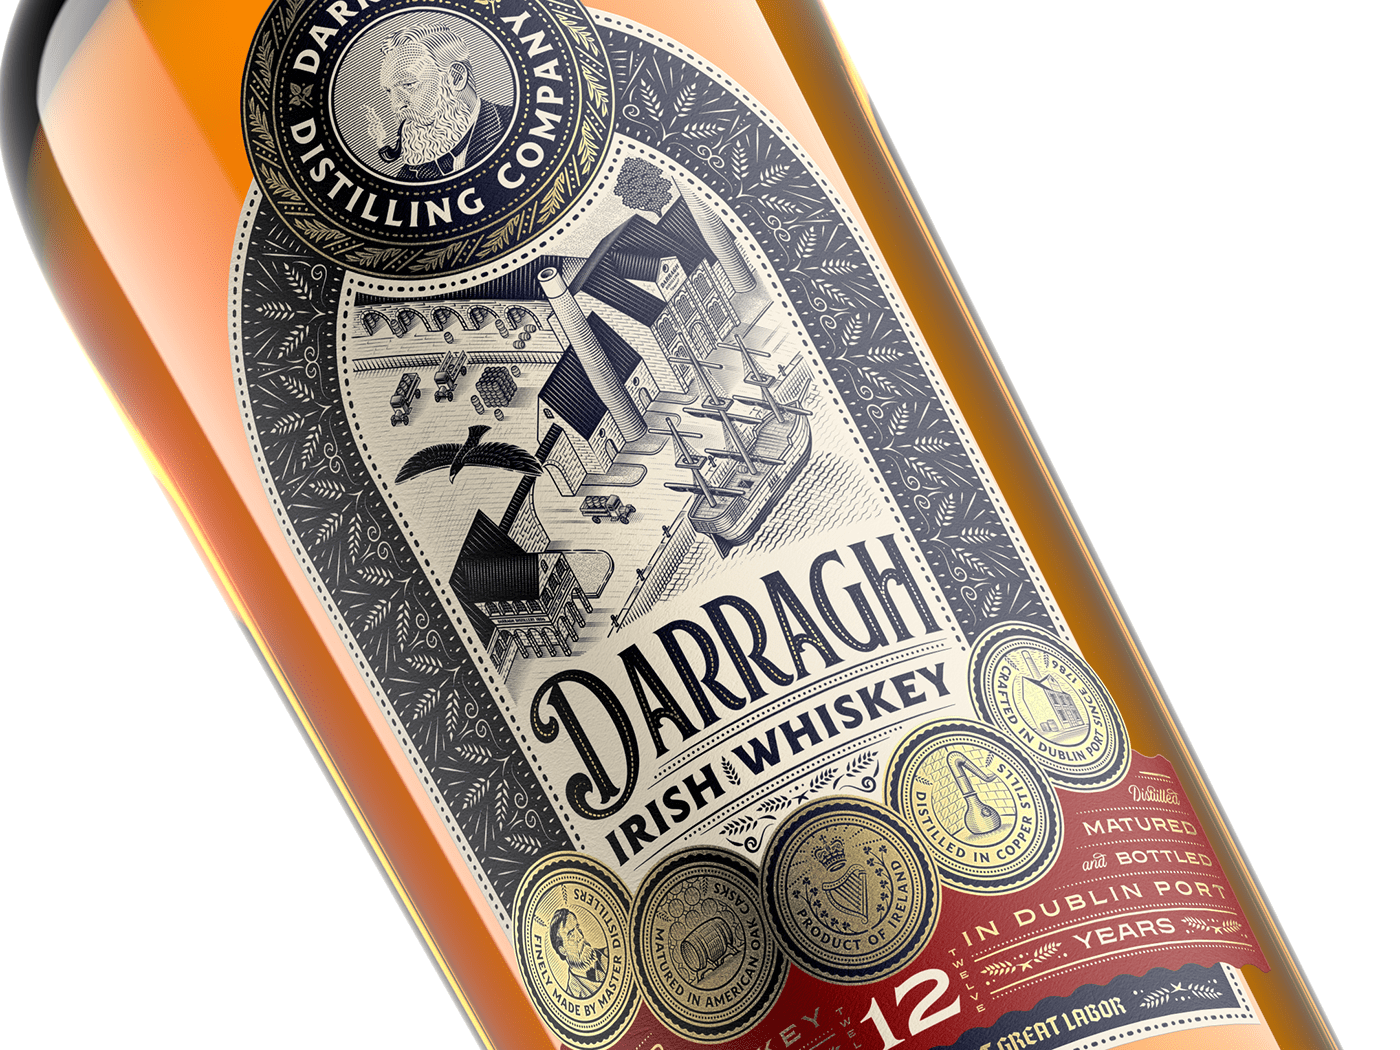 engraving etching ILLUSTRATION  Illustrator line art packaging design Spirits Spirits Packaging Whiskey Whisky